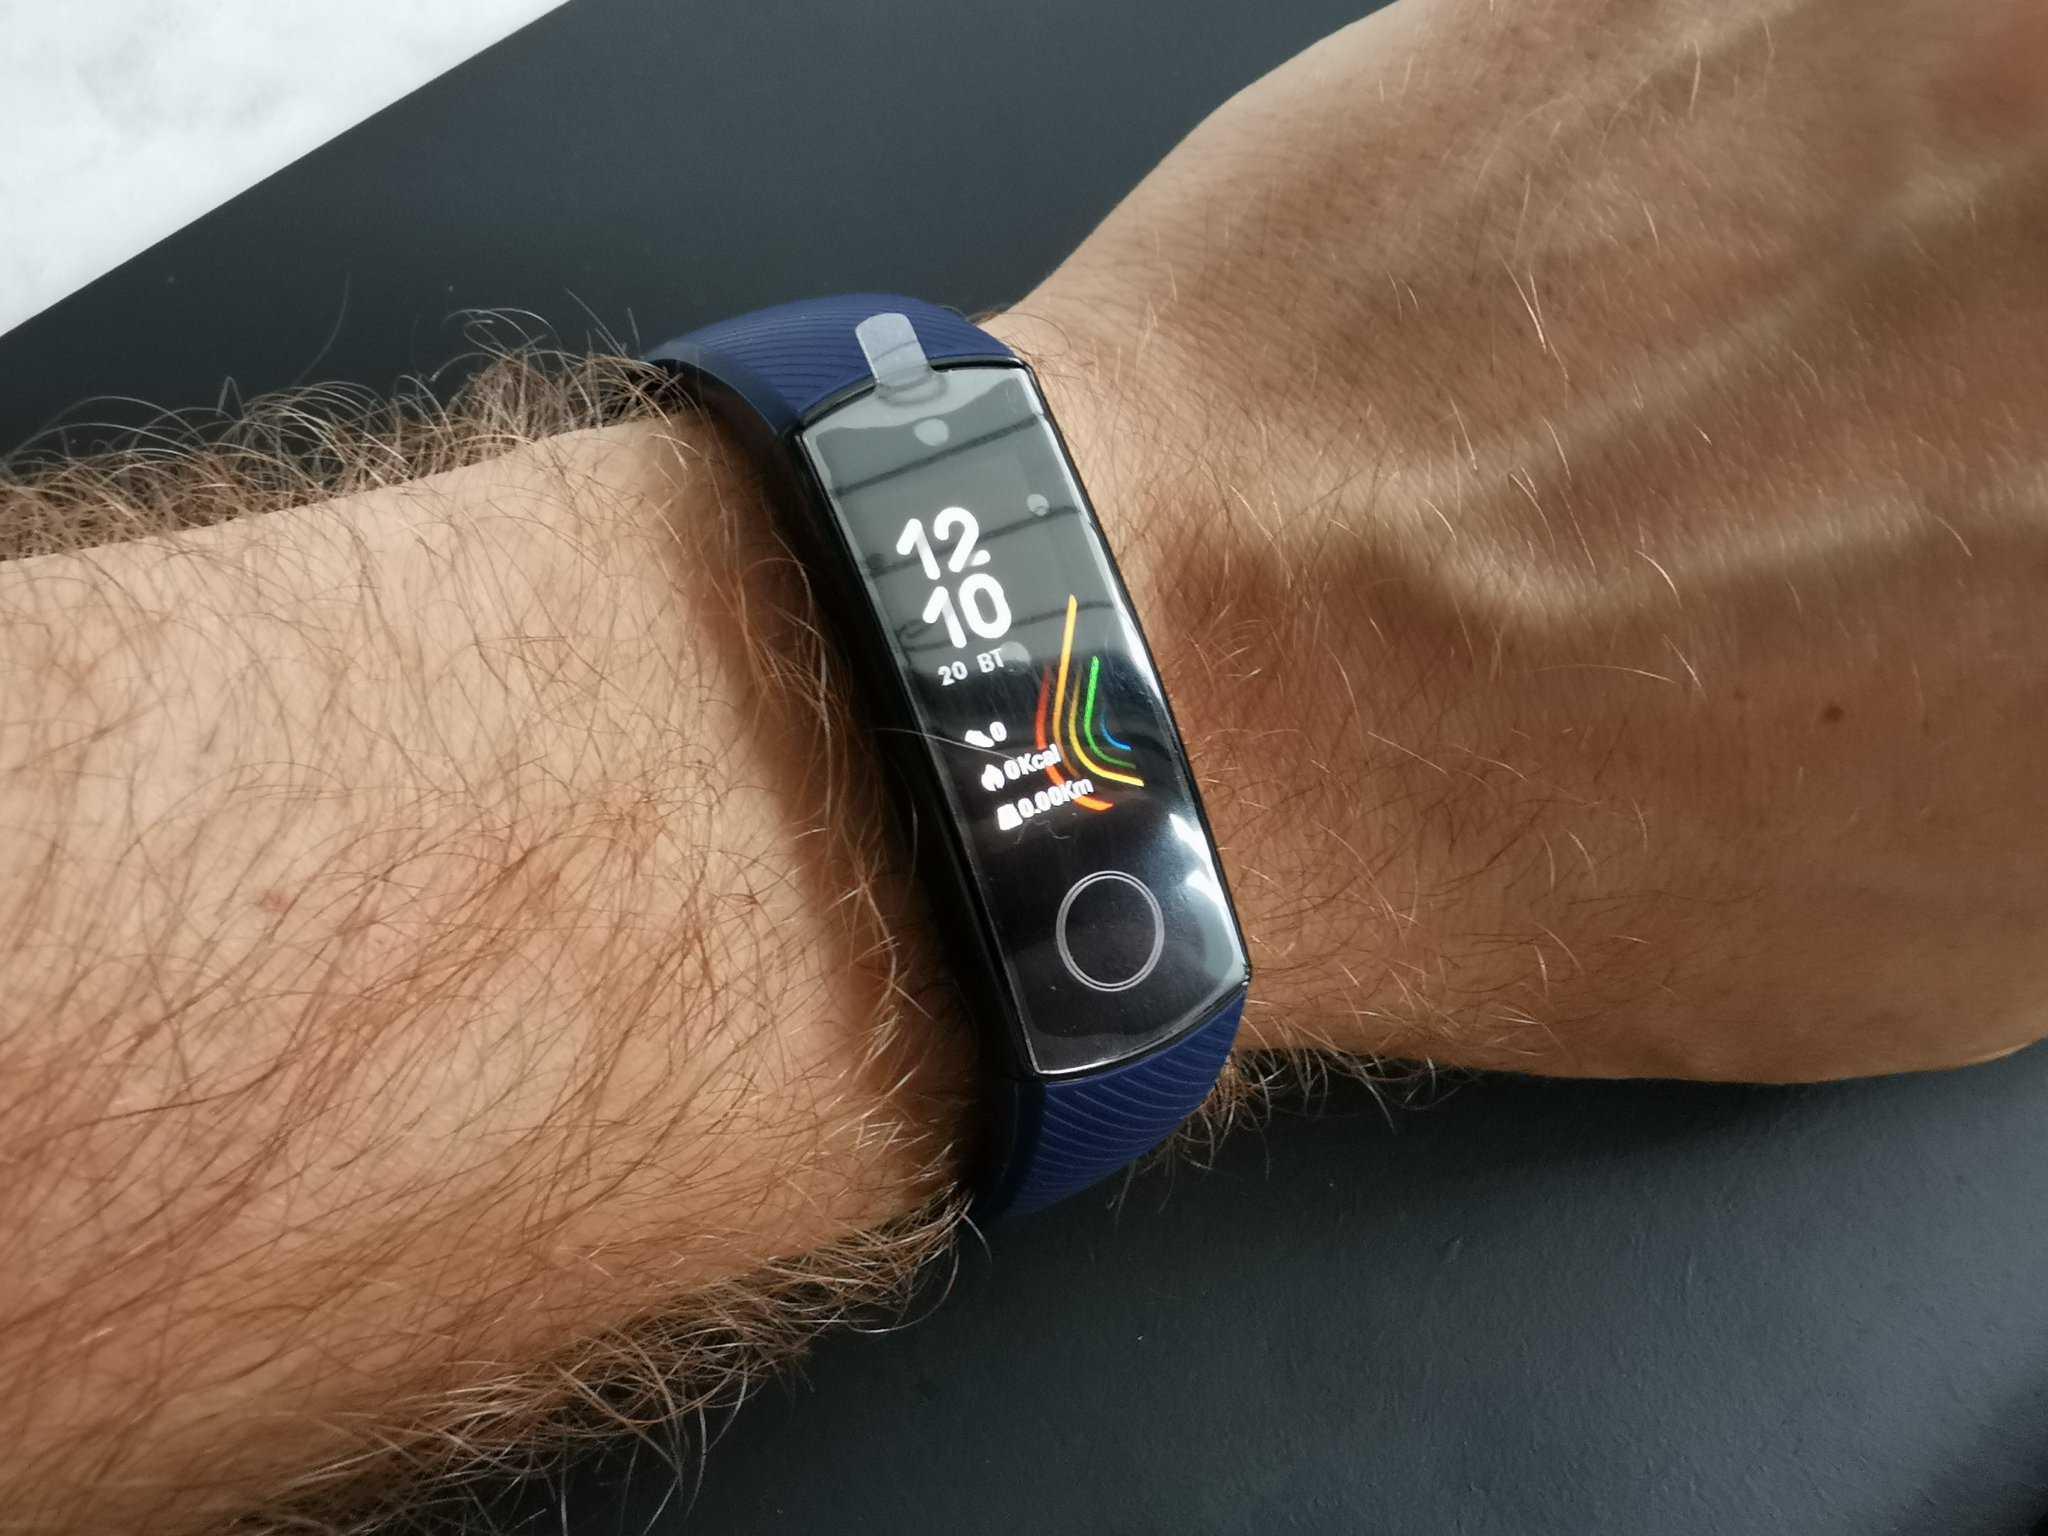 В сентябре 2018 года в рамках презентации смартфона Honor 8X был представлен фитнес-браслет Band 4